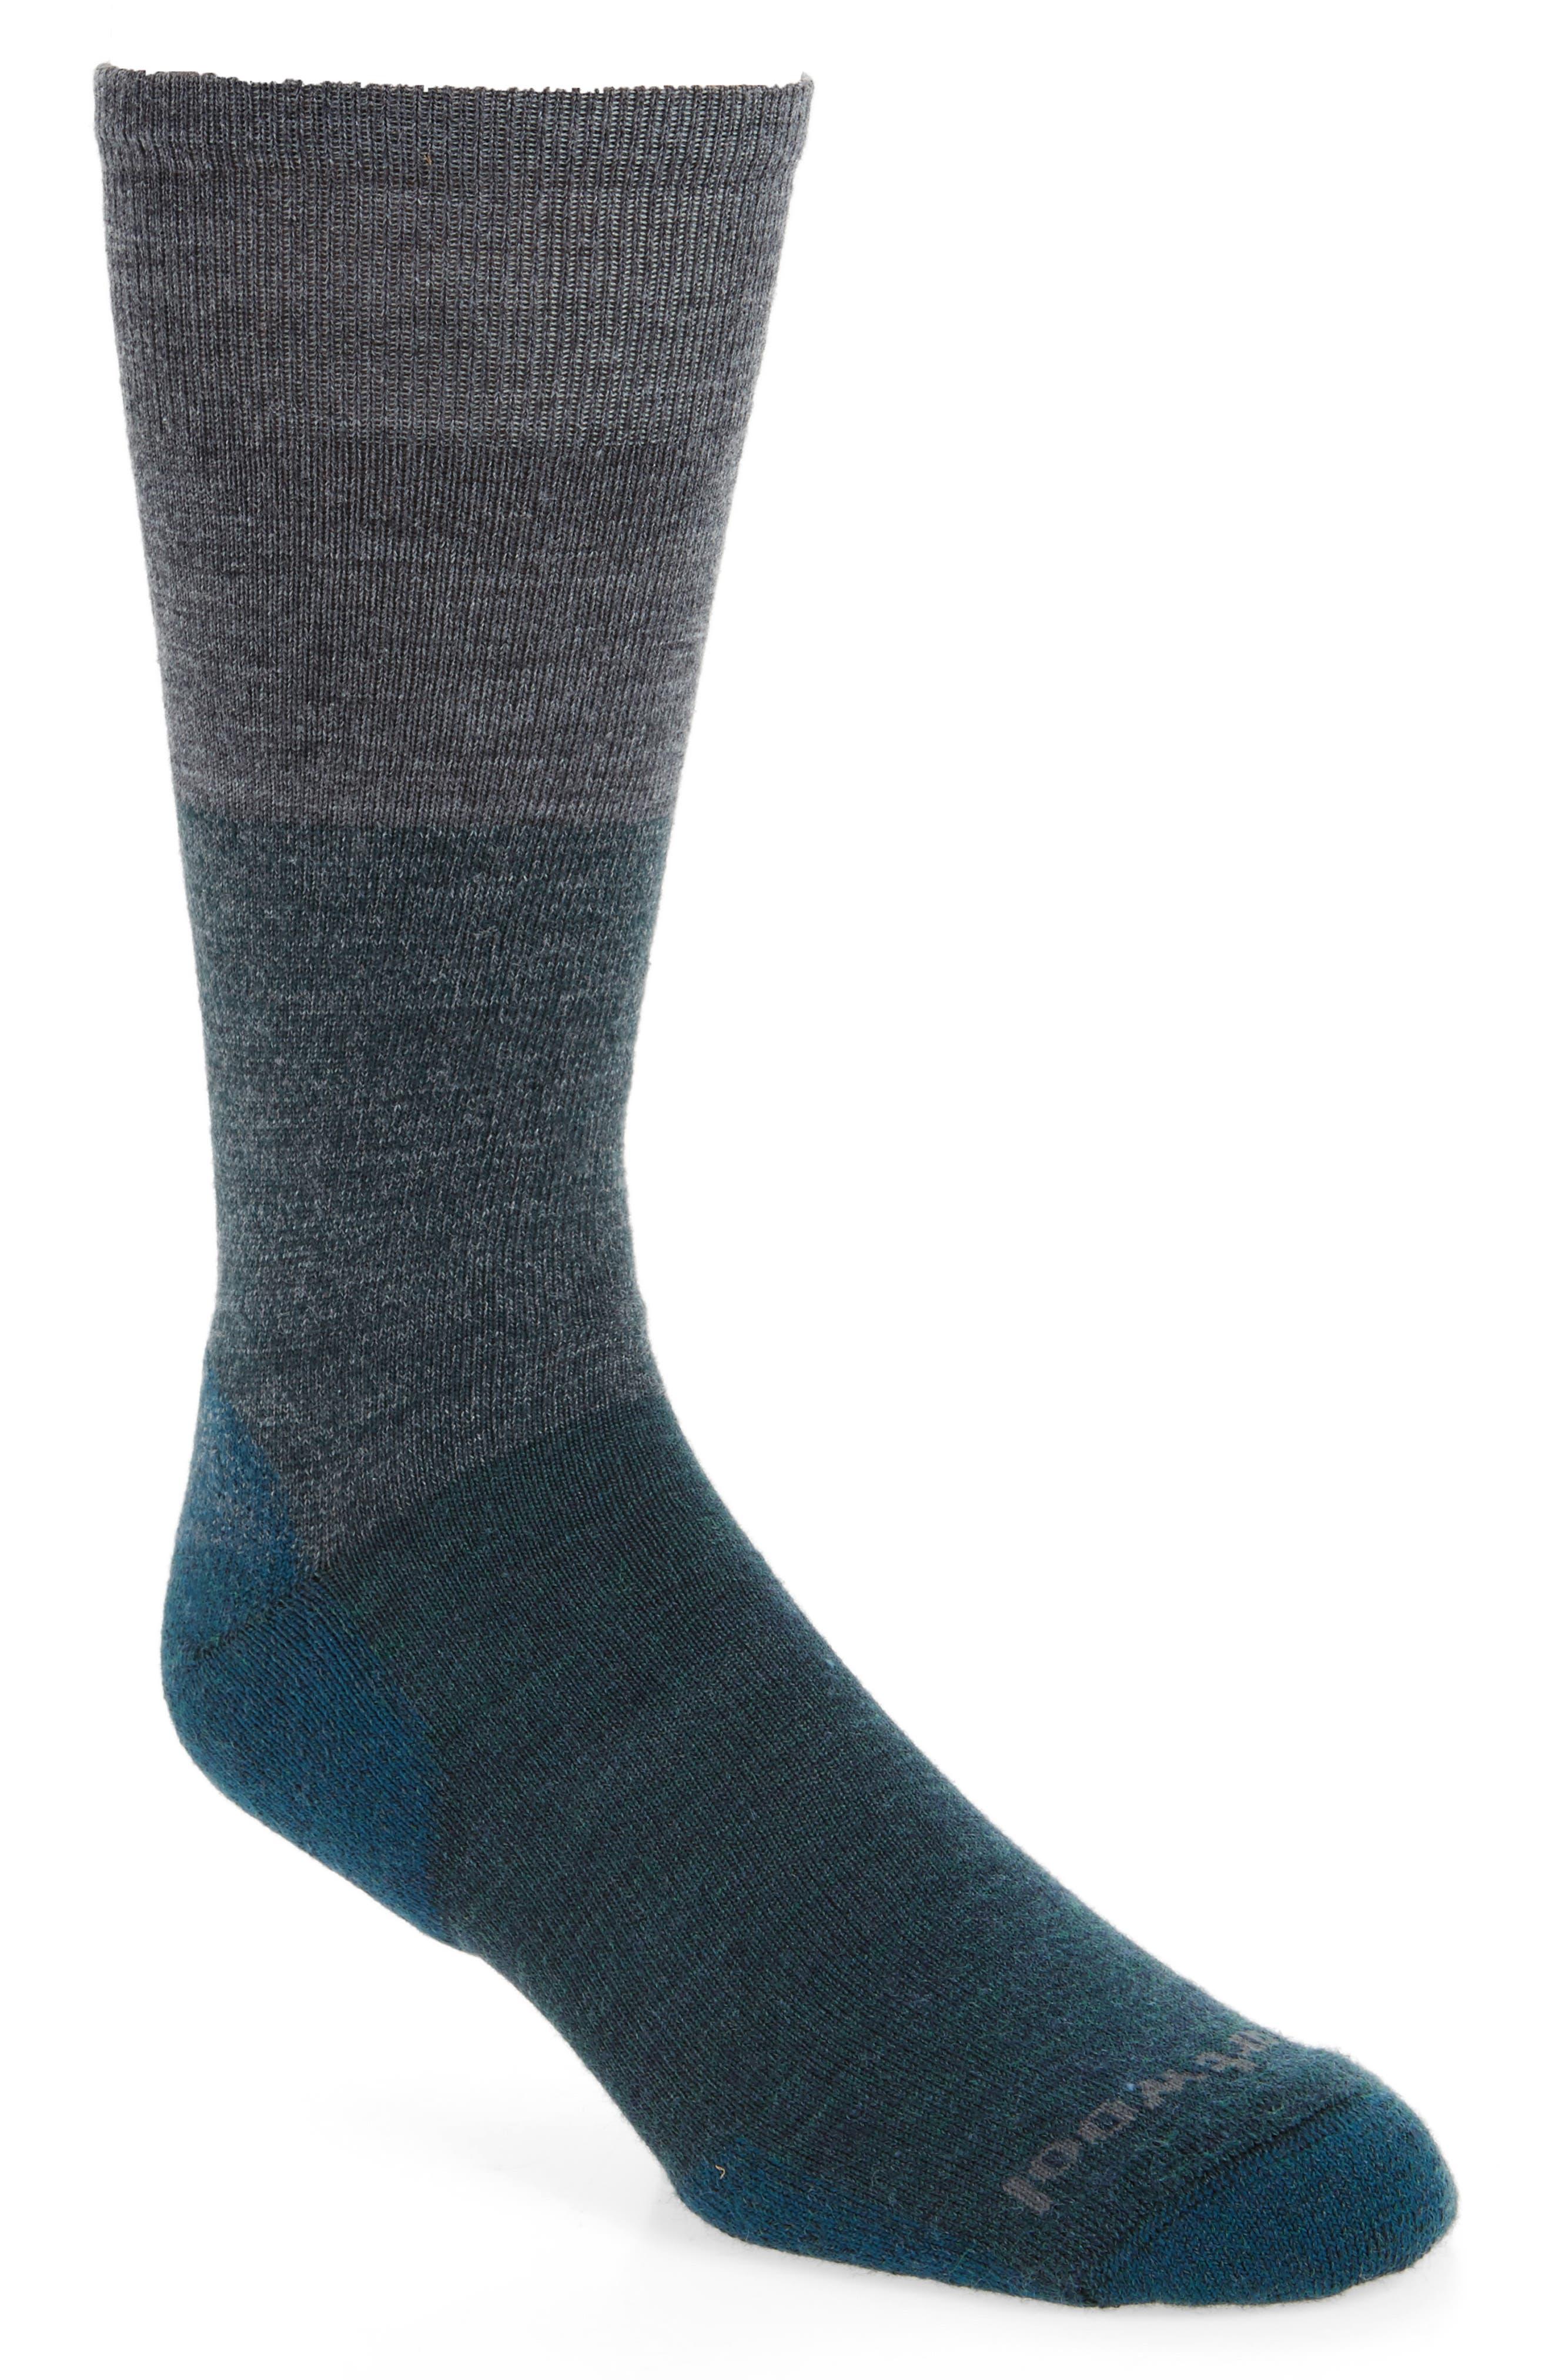 Main Image - Smartwool Faversham Colorblock Socks